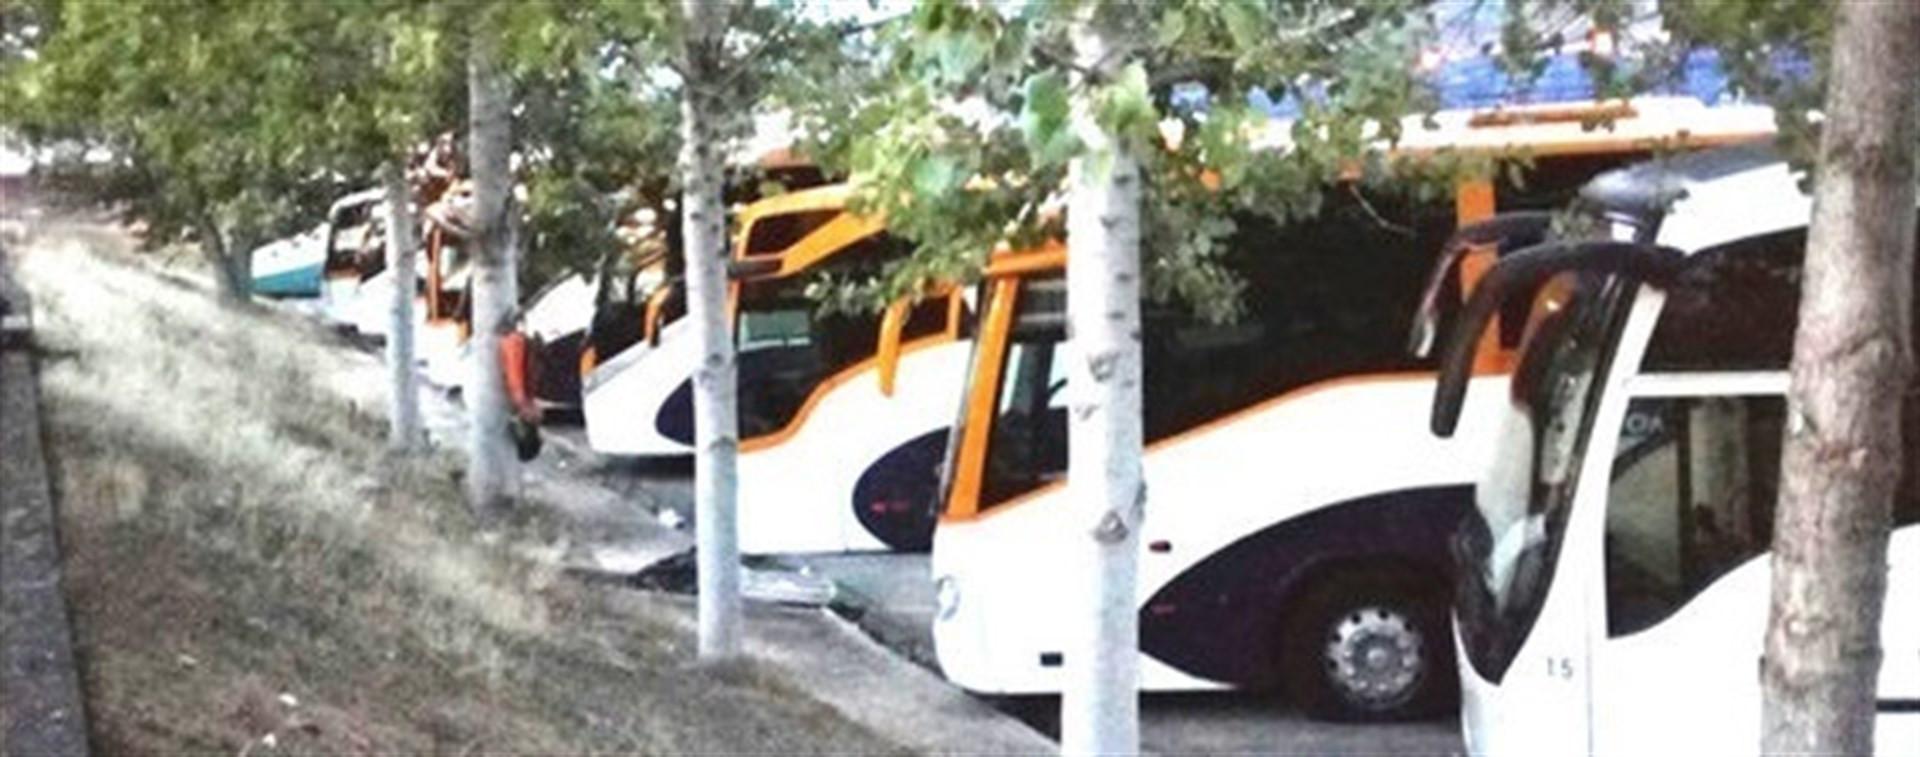 Autobusesaparcados3